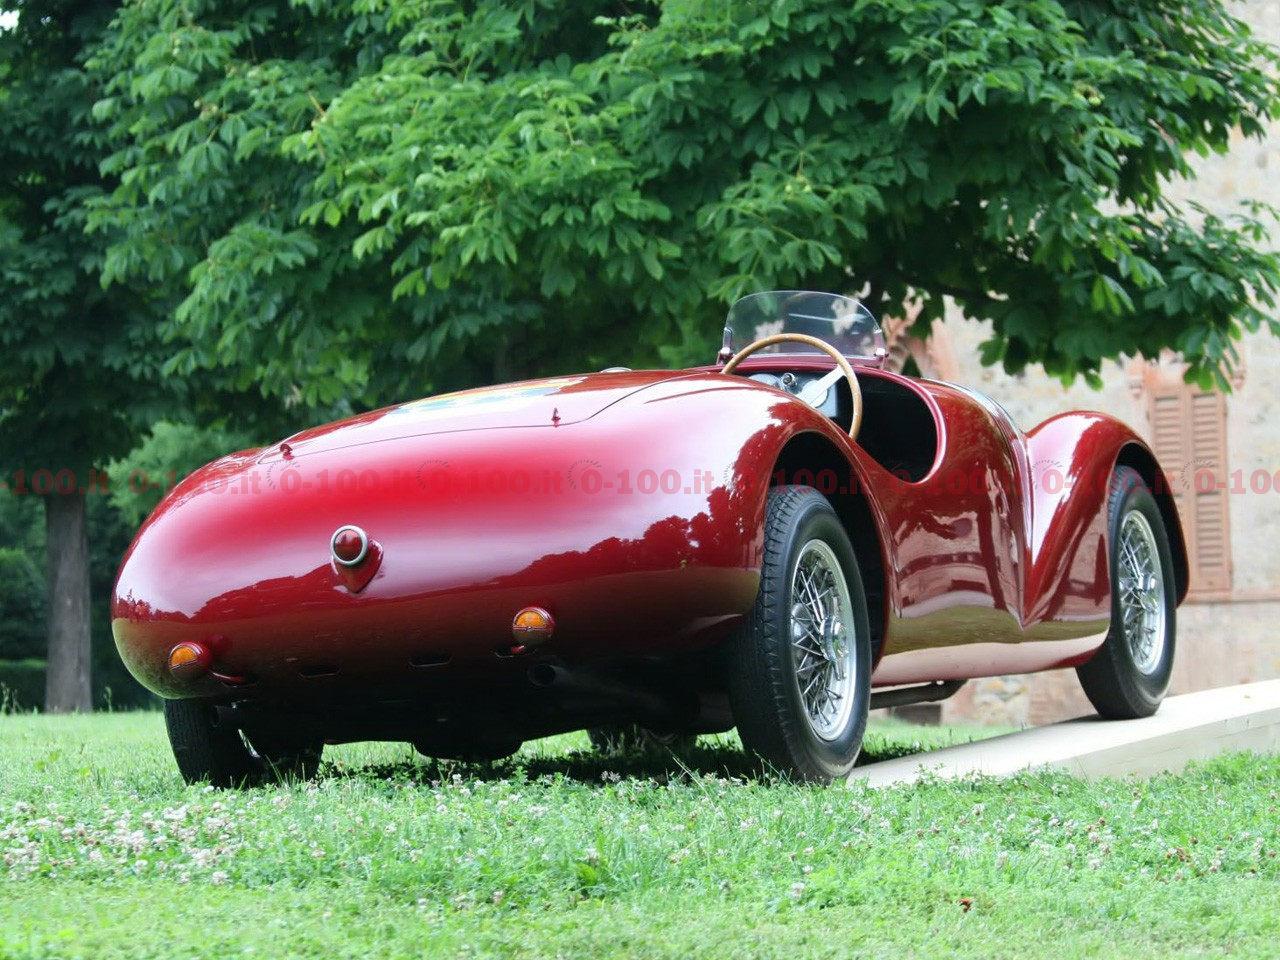 ferrari-125_sport-12cilindri-01C-march_12-1947-enzo-ferrari_0-100_7